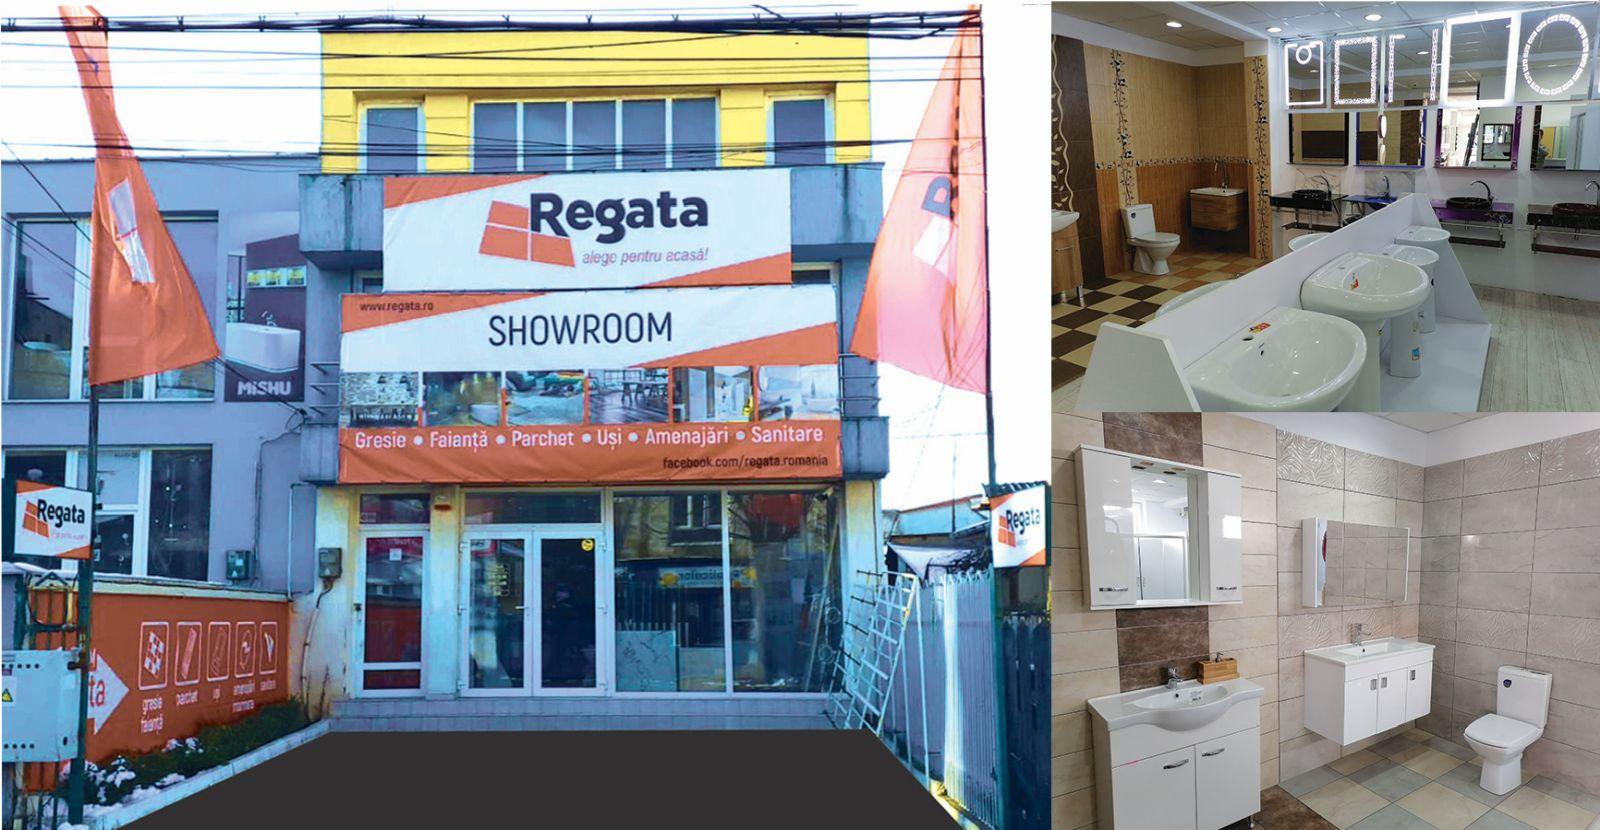 Regata inaugurează luni, 8 februarie, primul showroom din Constanța!